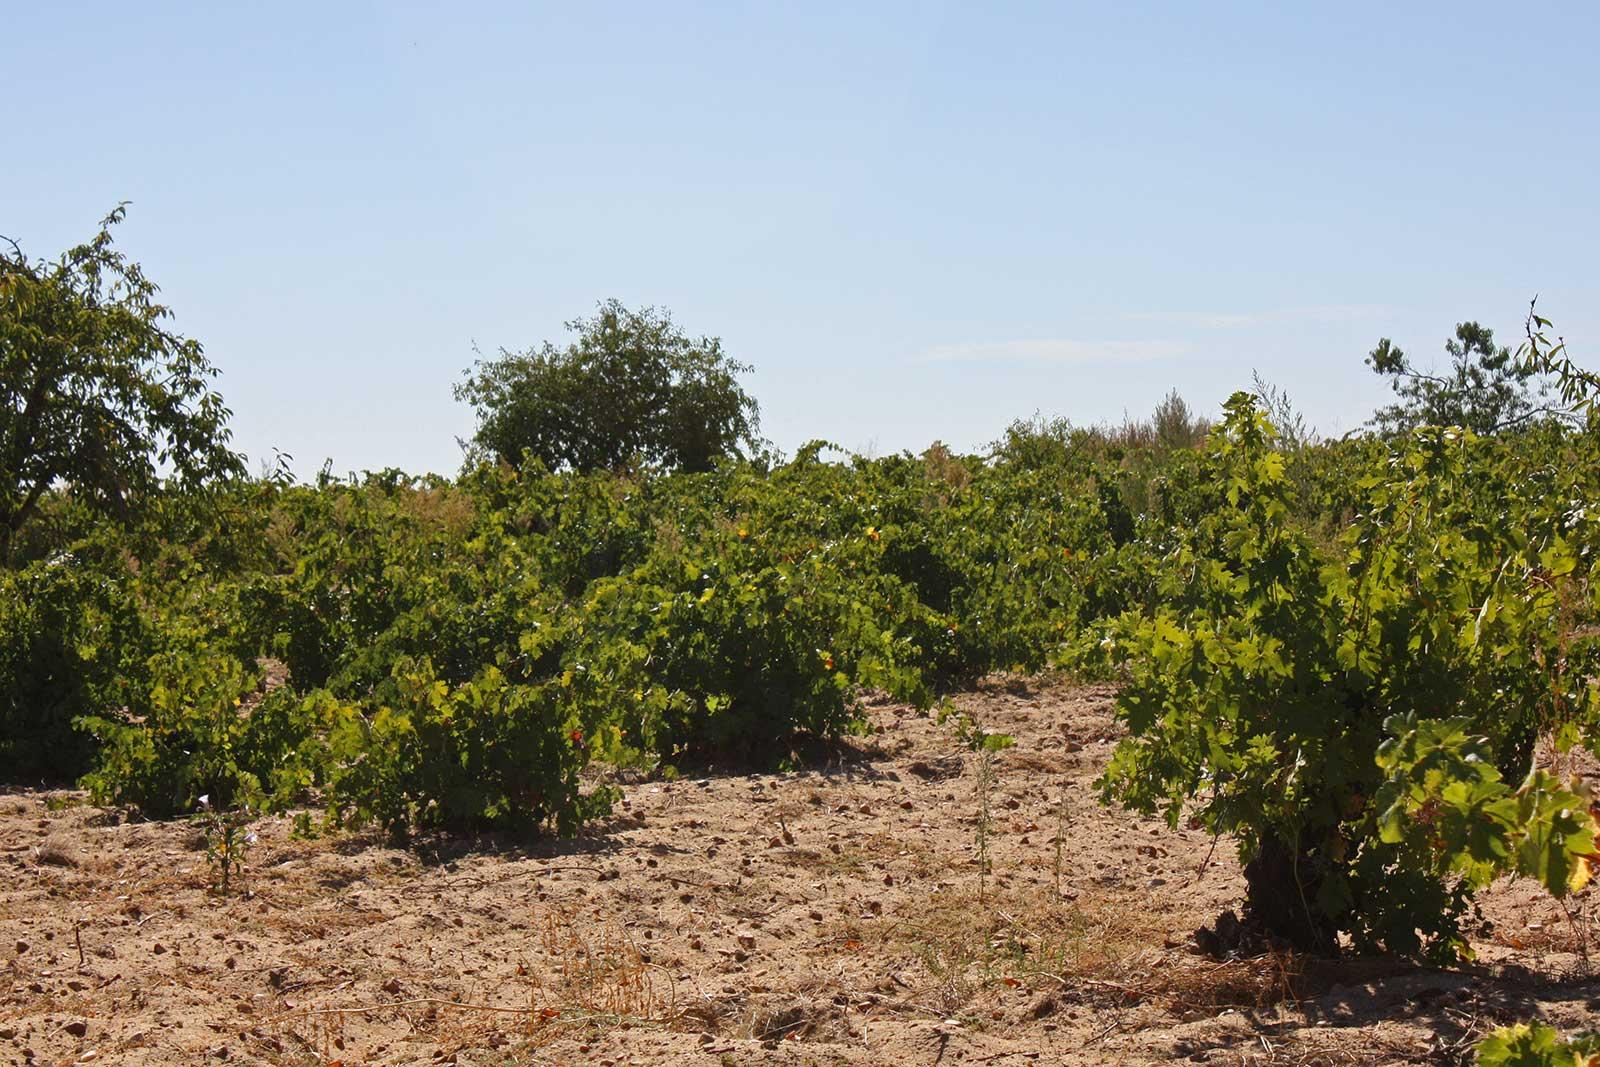 Vineyards of Toro. ©Vintae